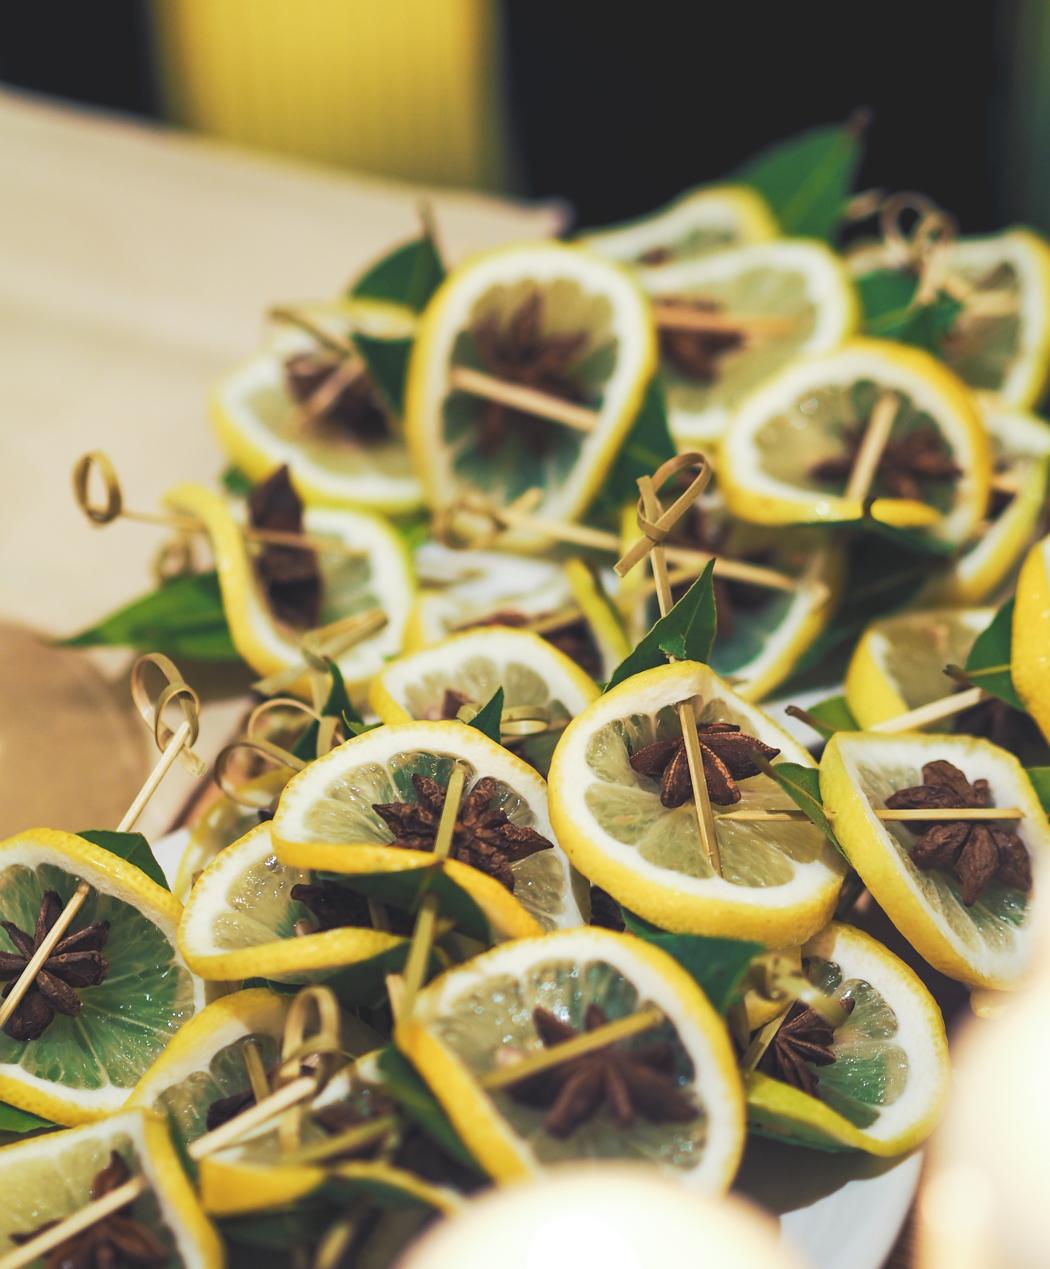 lemon and star anise